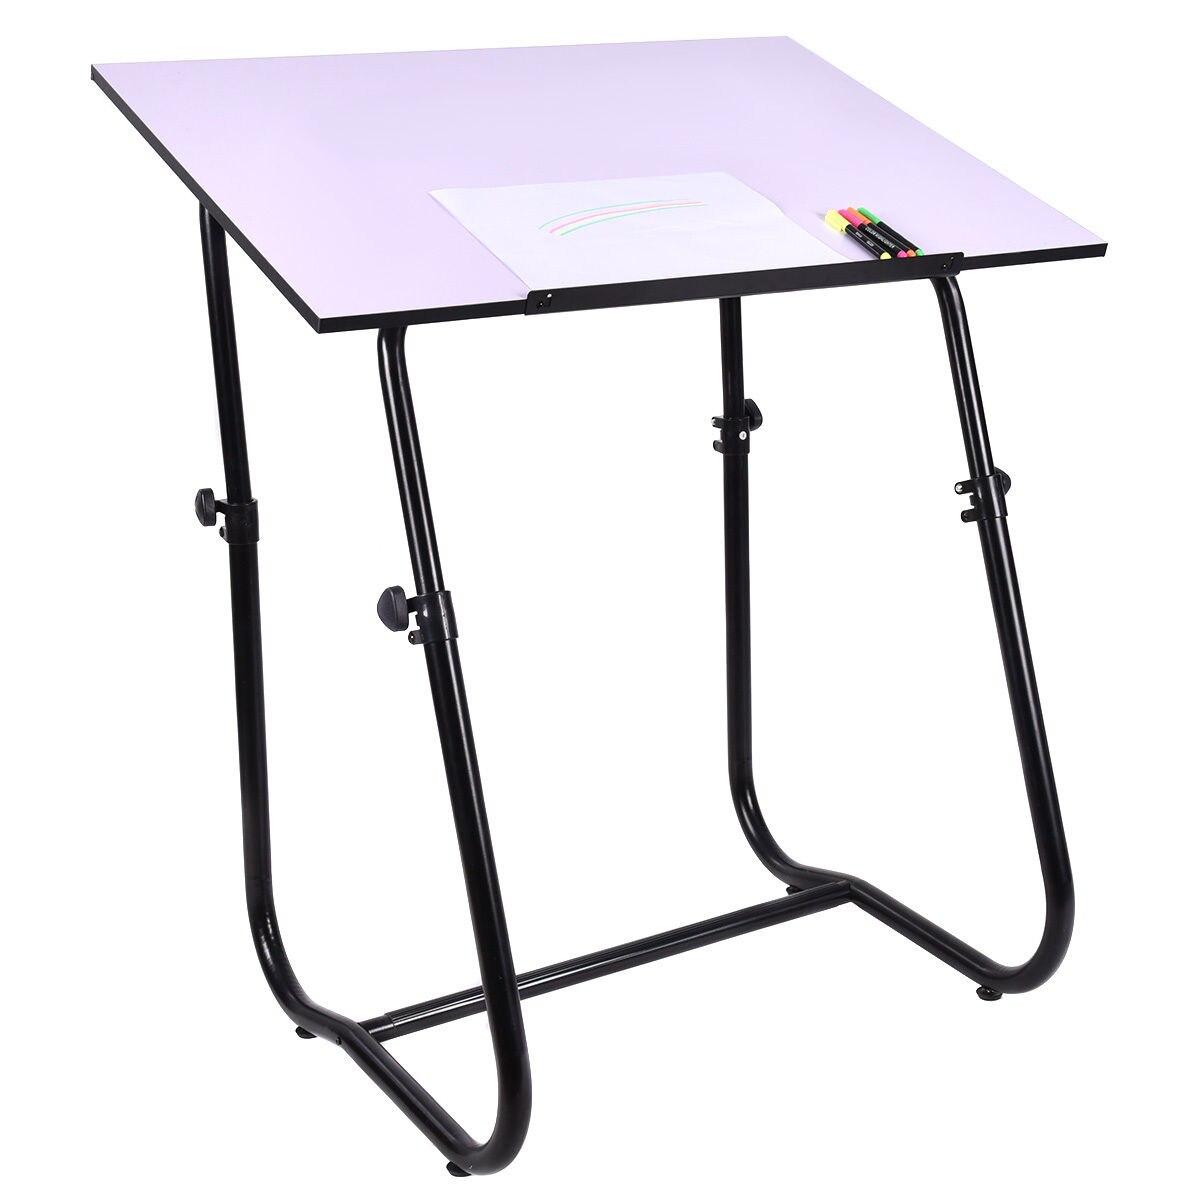 Giantex Drawing Desk Portable Drafting Table Adjustable Art Craft Workstation Hobby White Modern Study Furniture HW52824